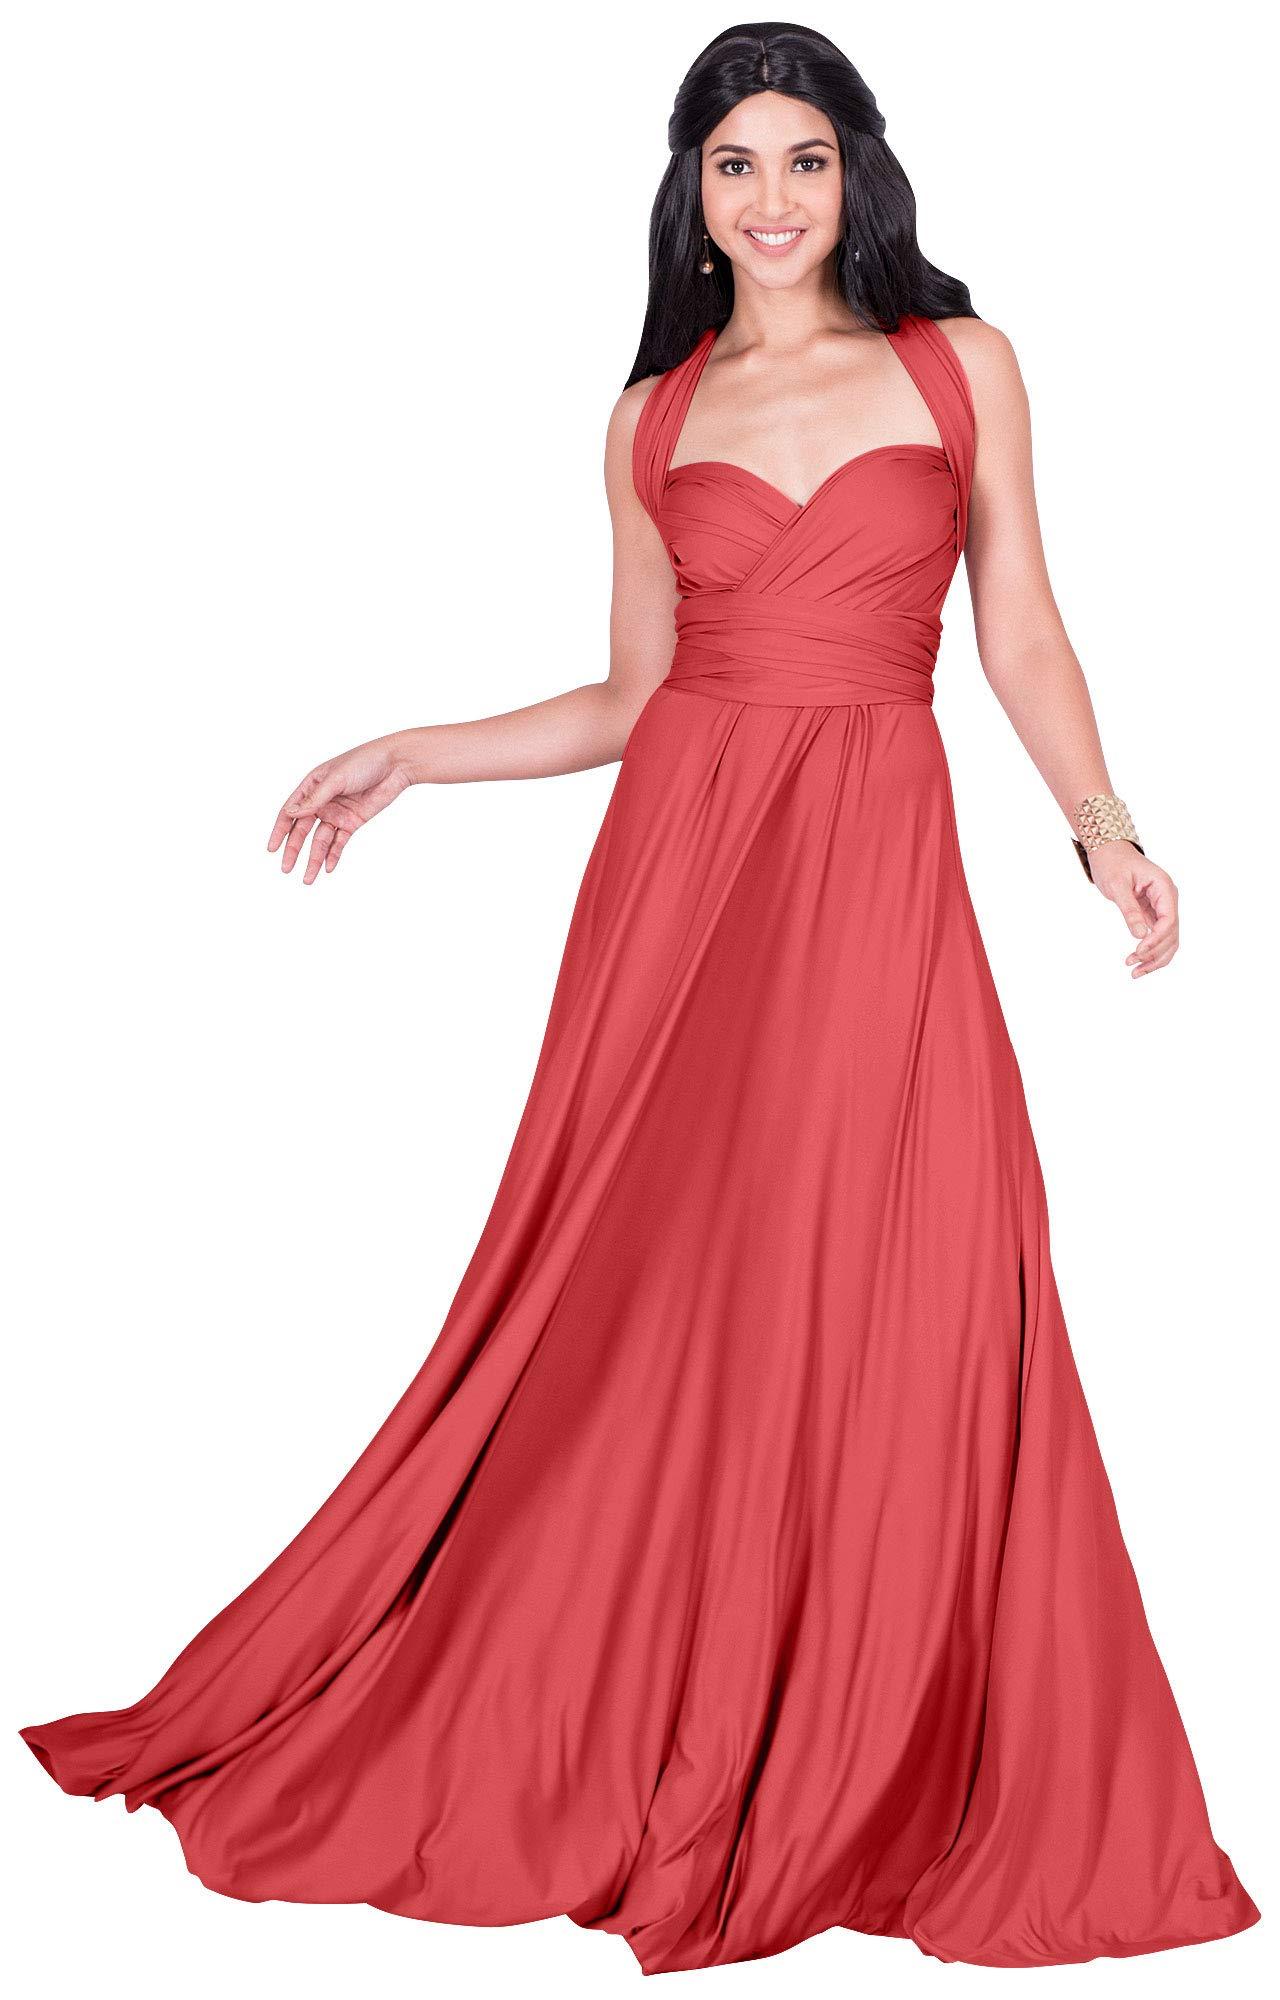 Available at Amazon: KOH KOH Women's Long Bridesmaid One Shoulder Convertible Wrap Cocktail Maxi Dress